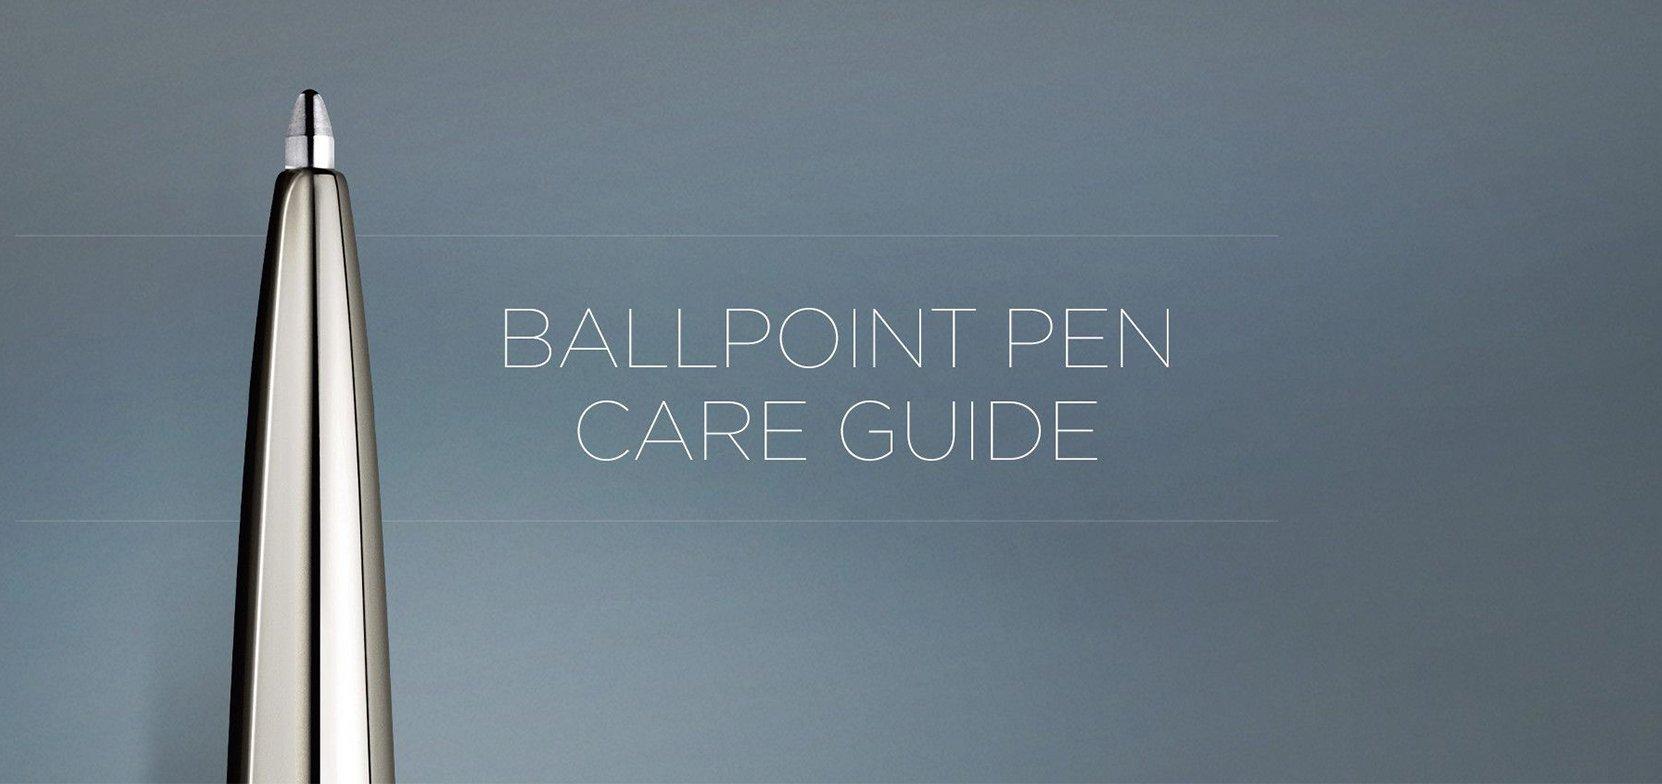 Ballpoint Pen Care Guide